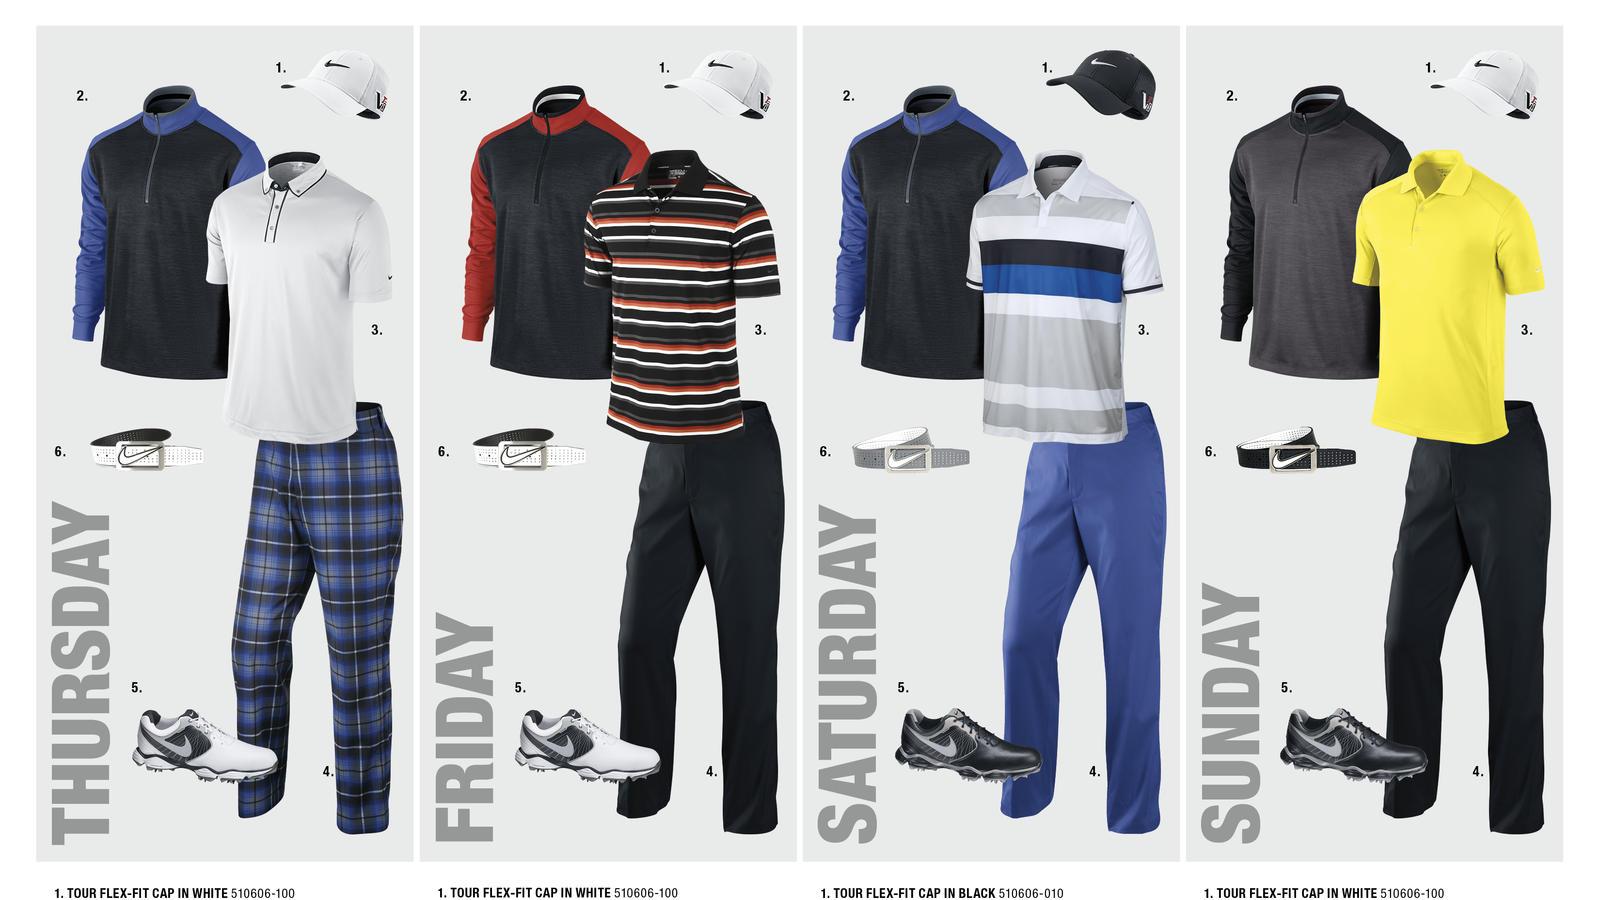 Francesco Molinari's Open Championship Looks